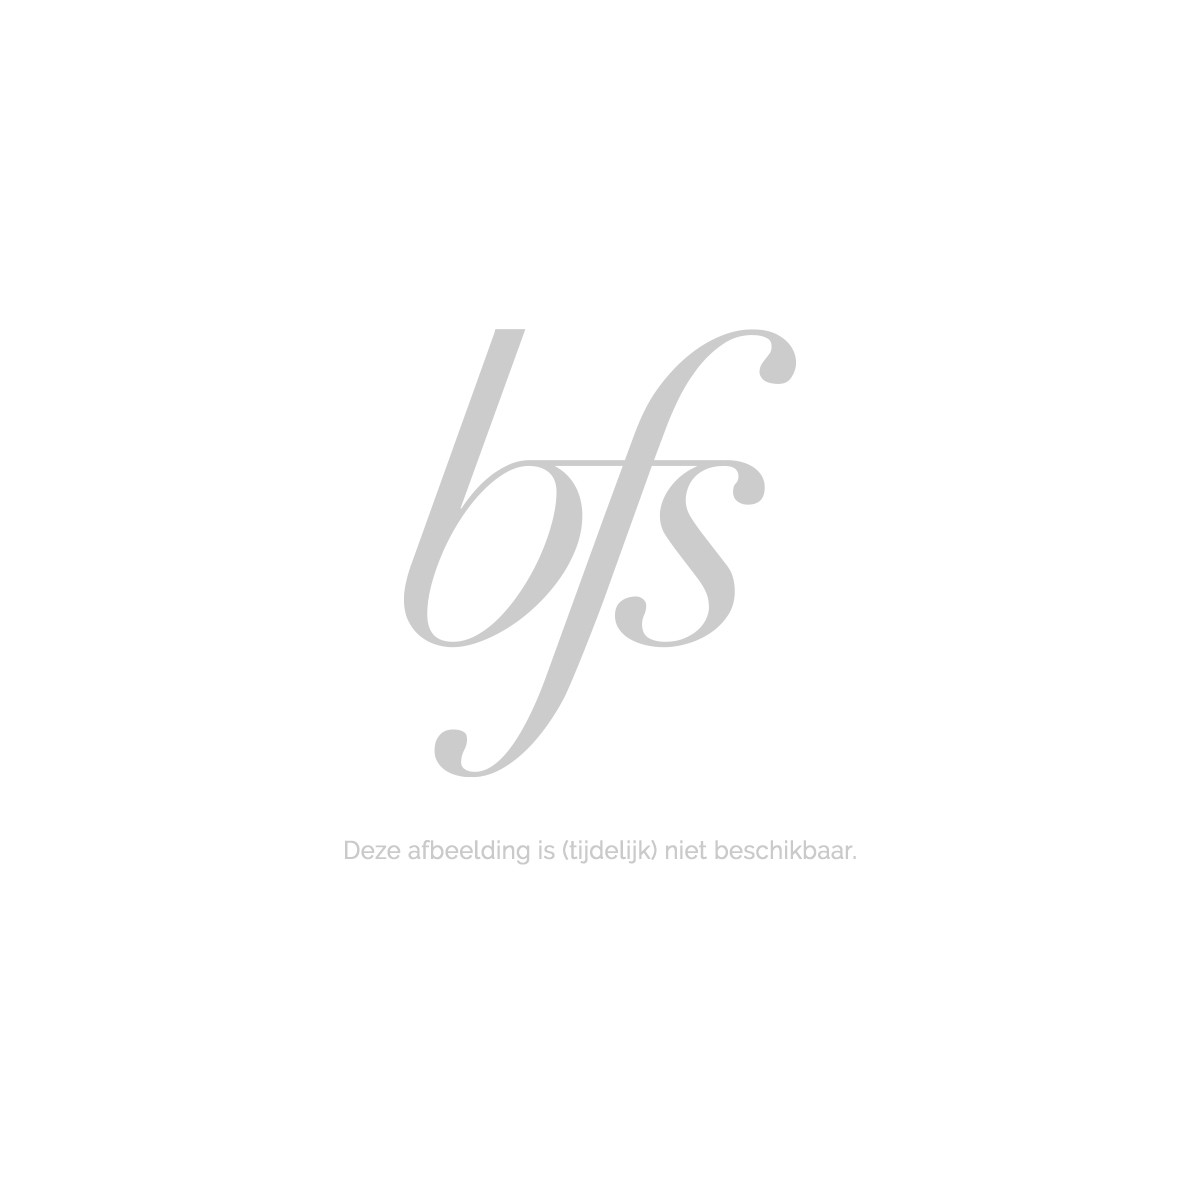 Holika Holika Cherry Blossom Body Cleanser Ad 390 Ml